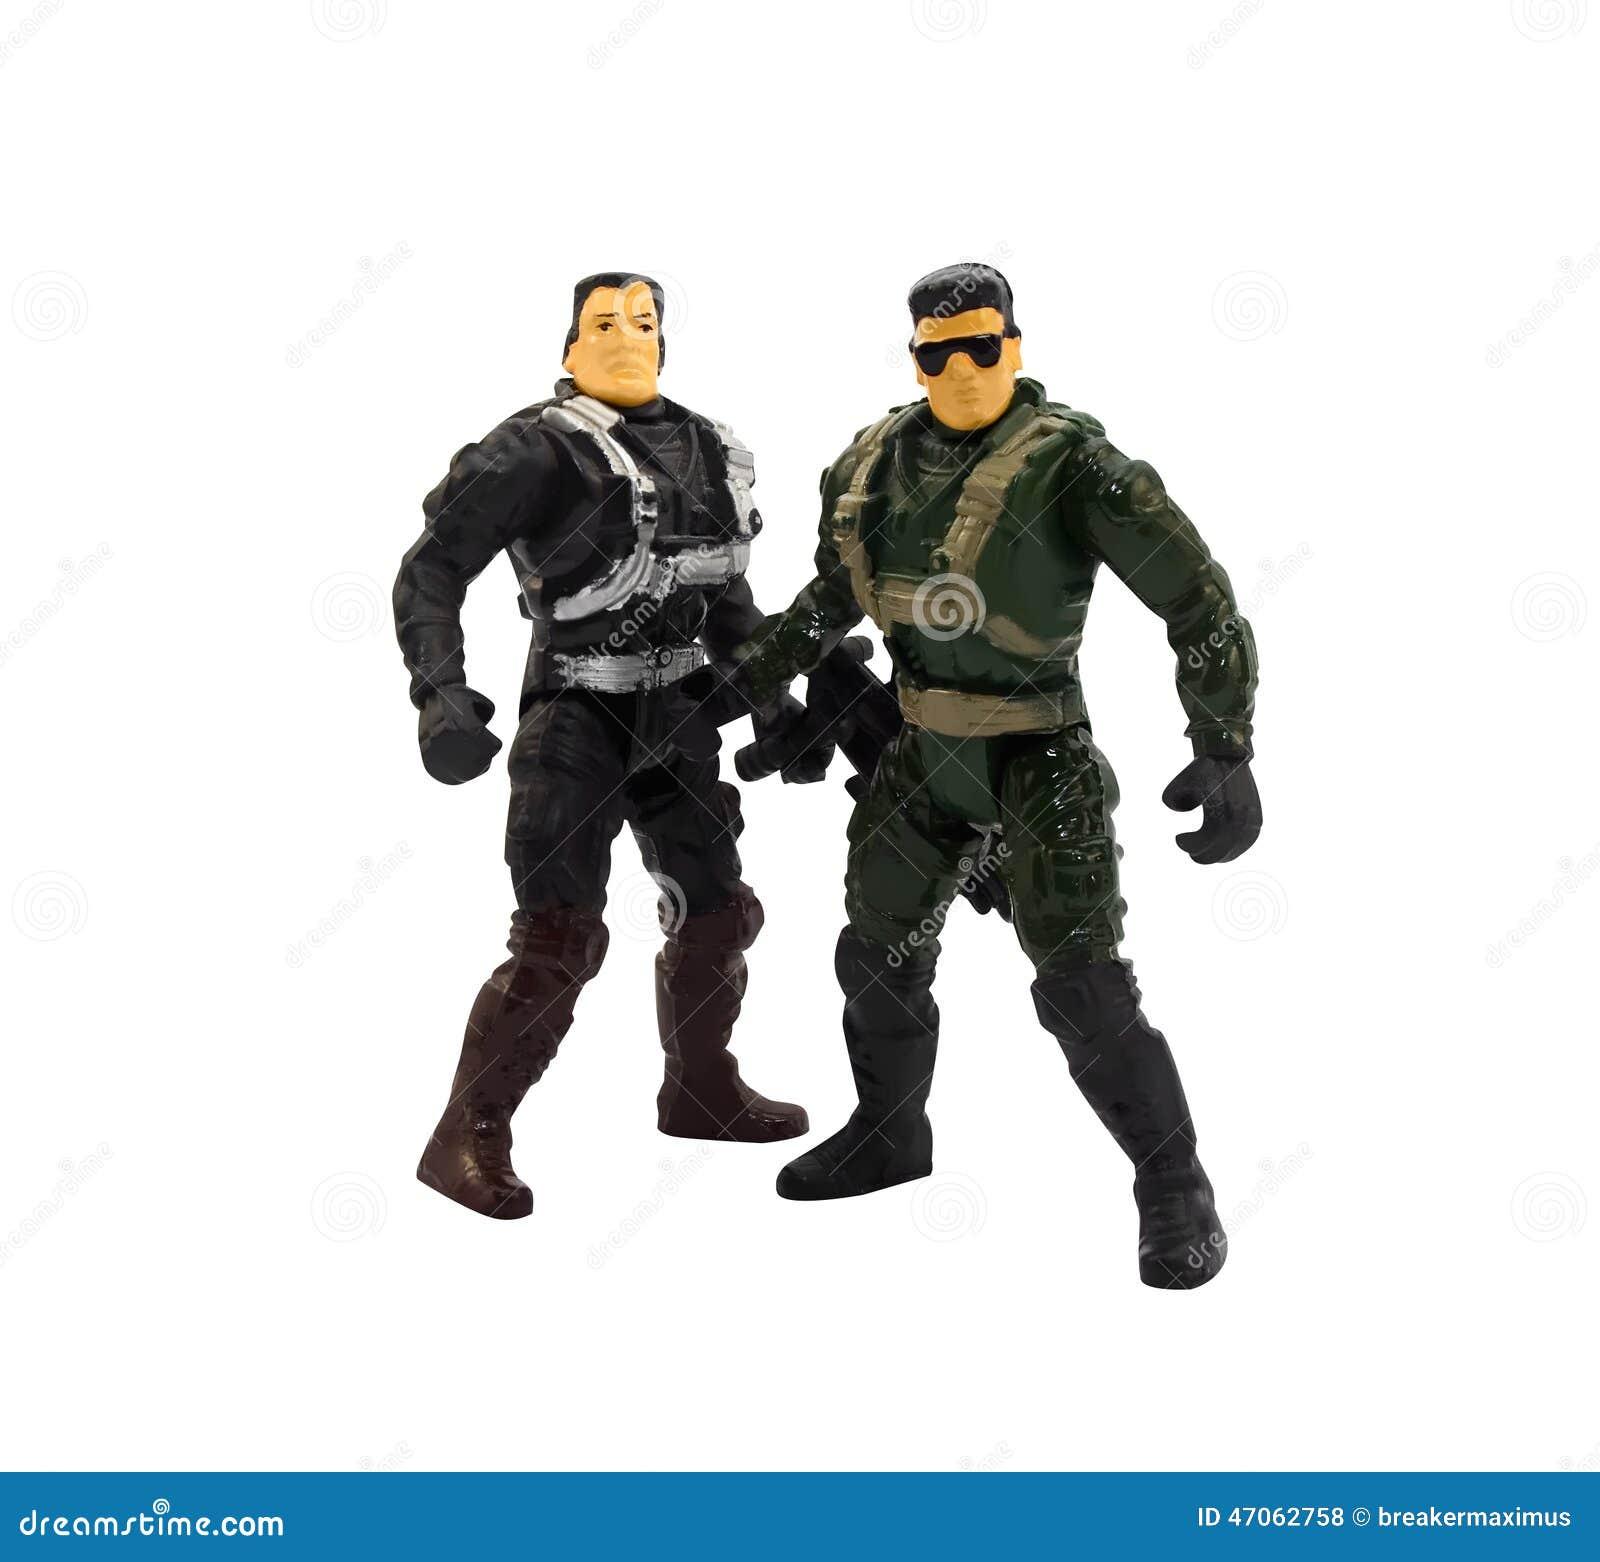 Juguetes militares de los hombres musculares